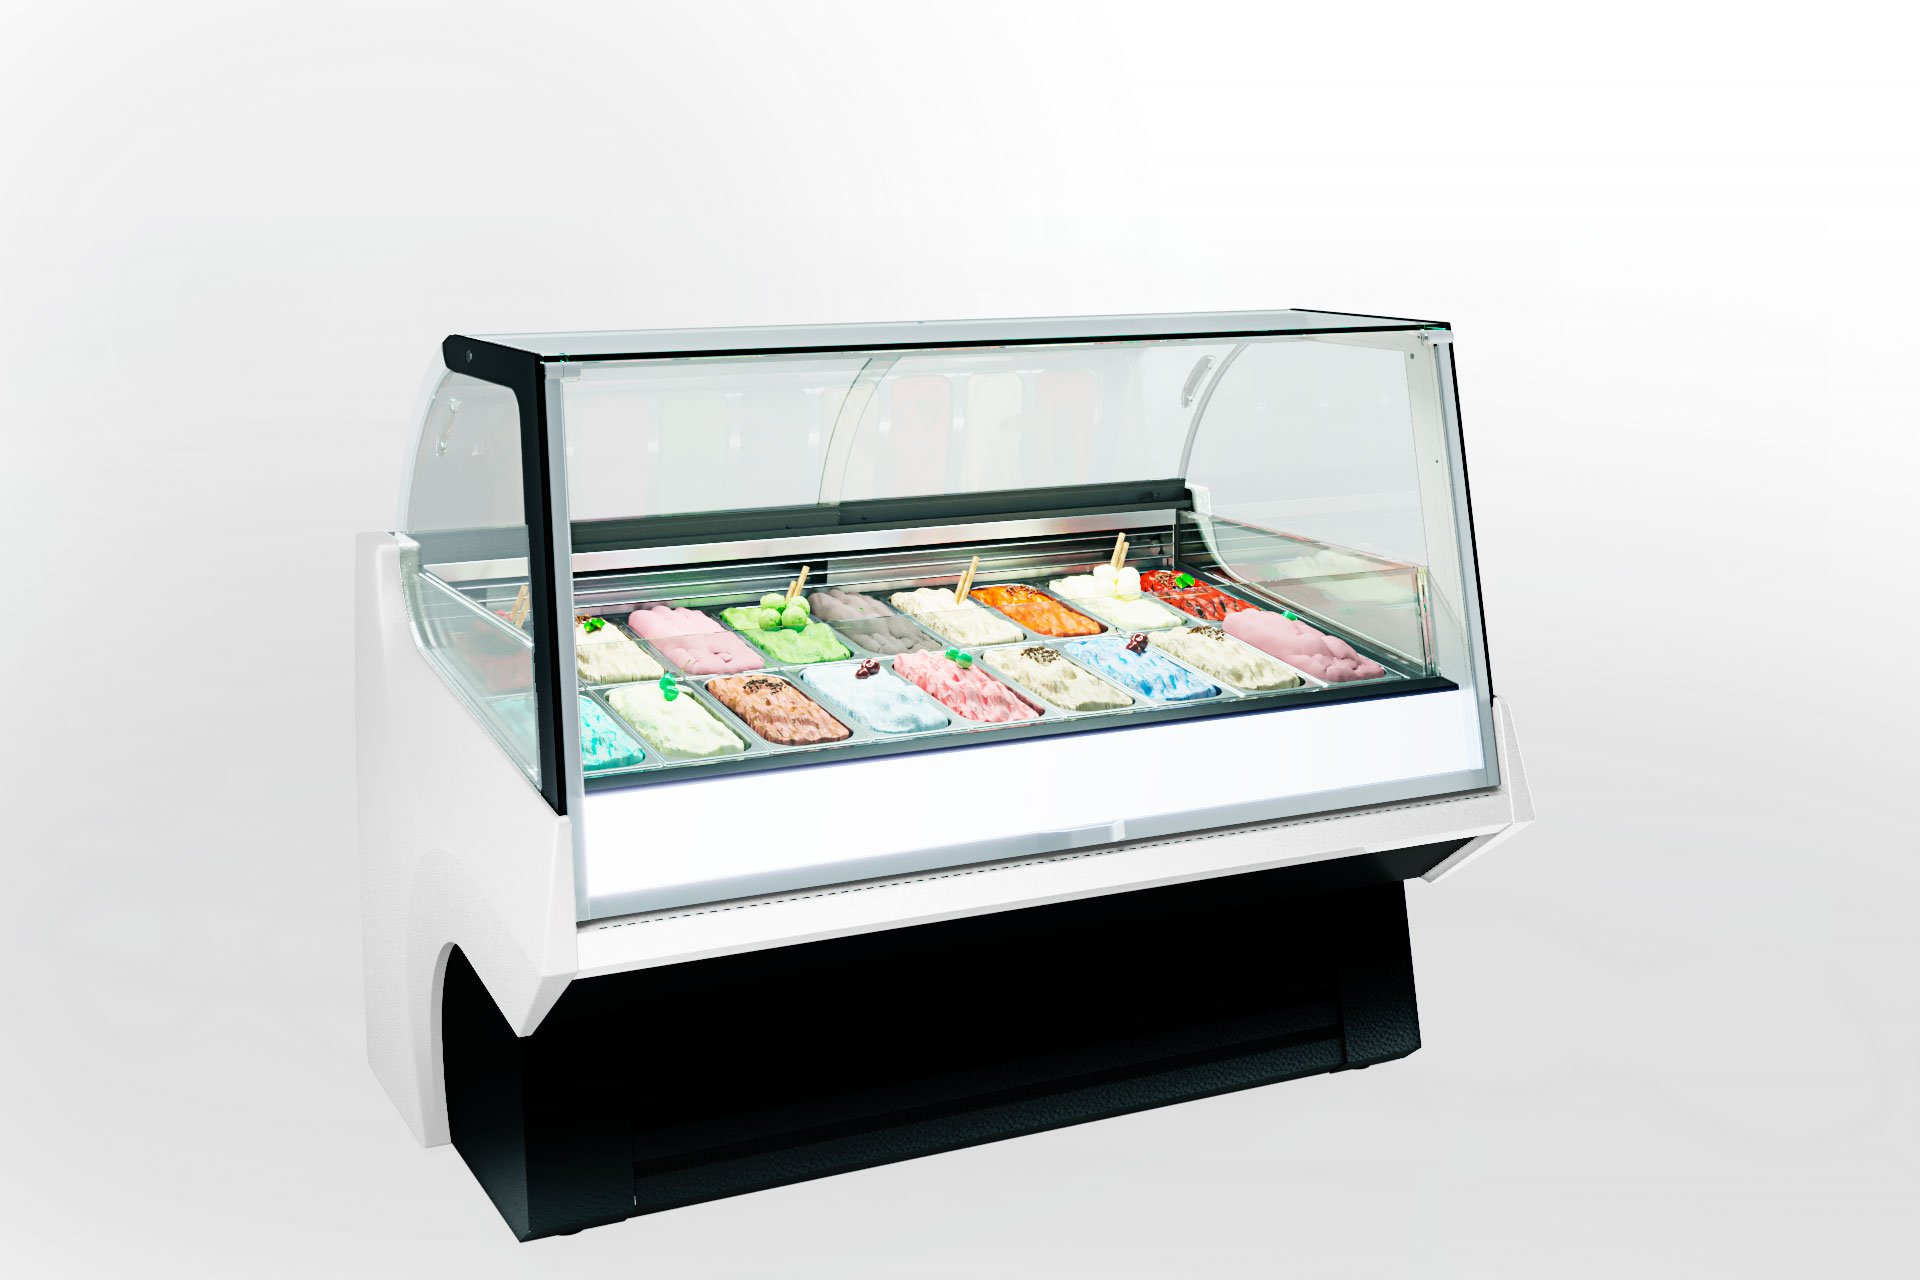 Tennessee AC 110 ice cream PS 172-DLA